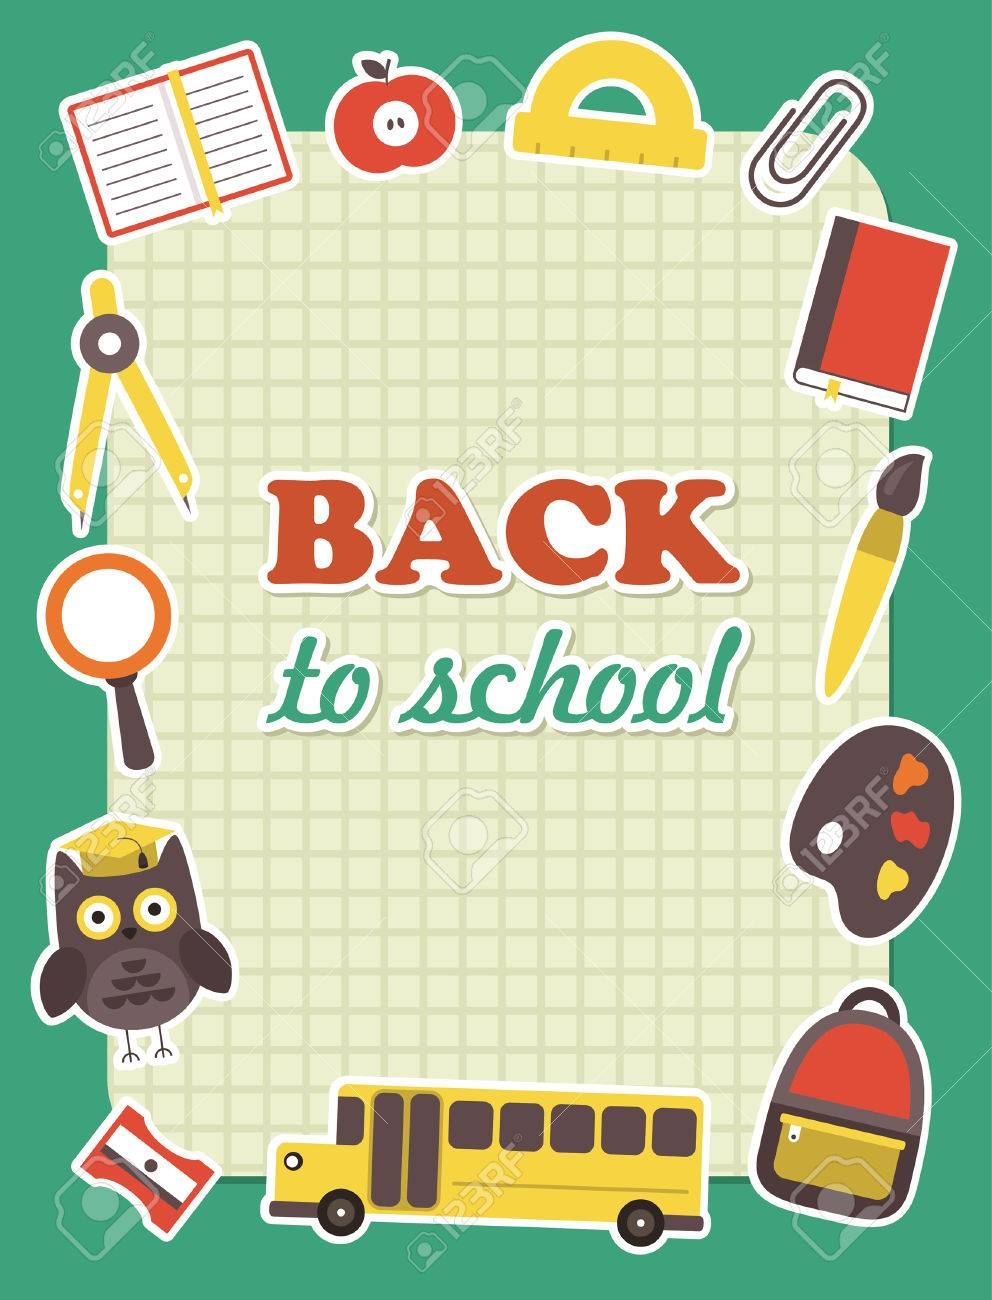 Back To School Frame Design Vector Illustration Royalty Free